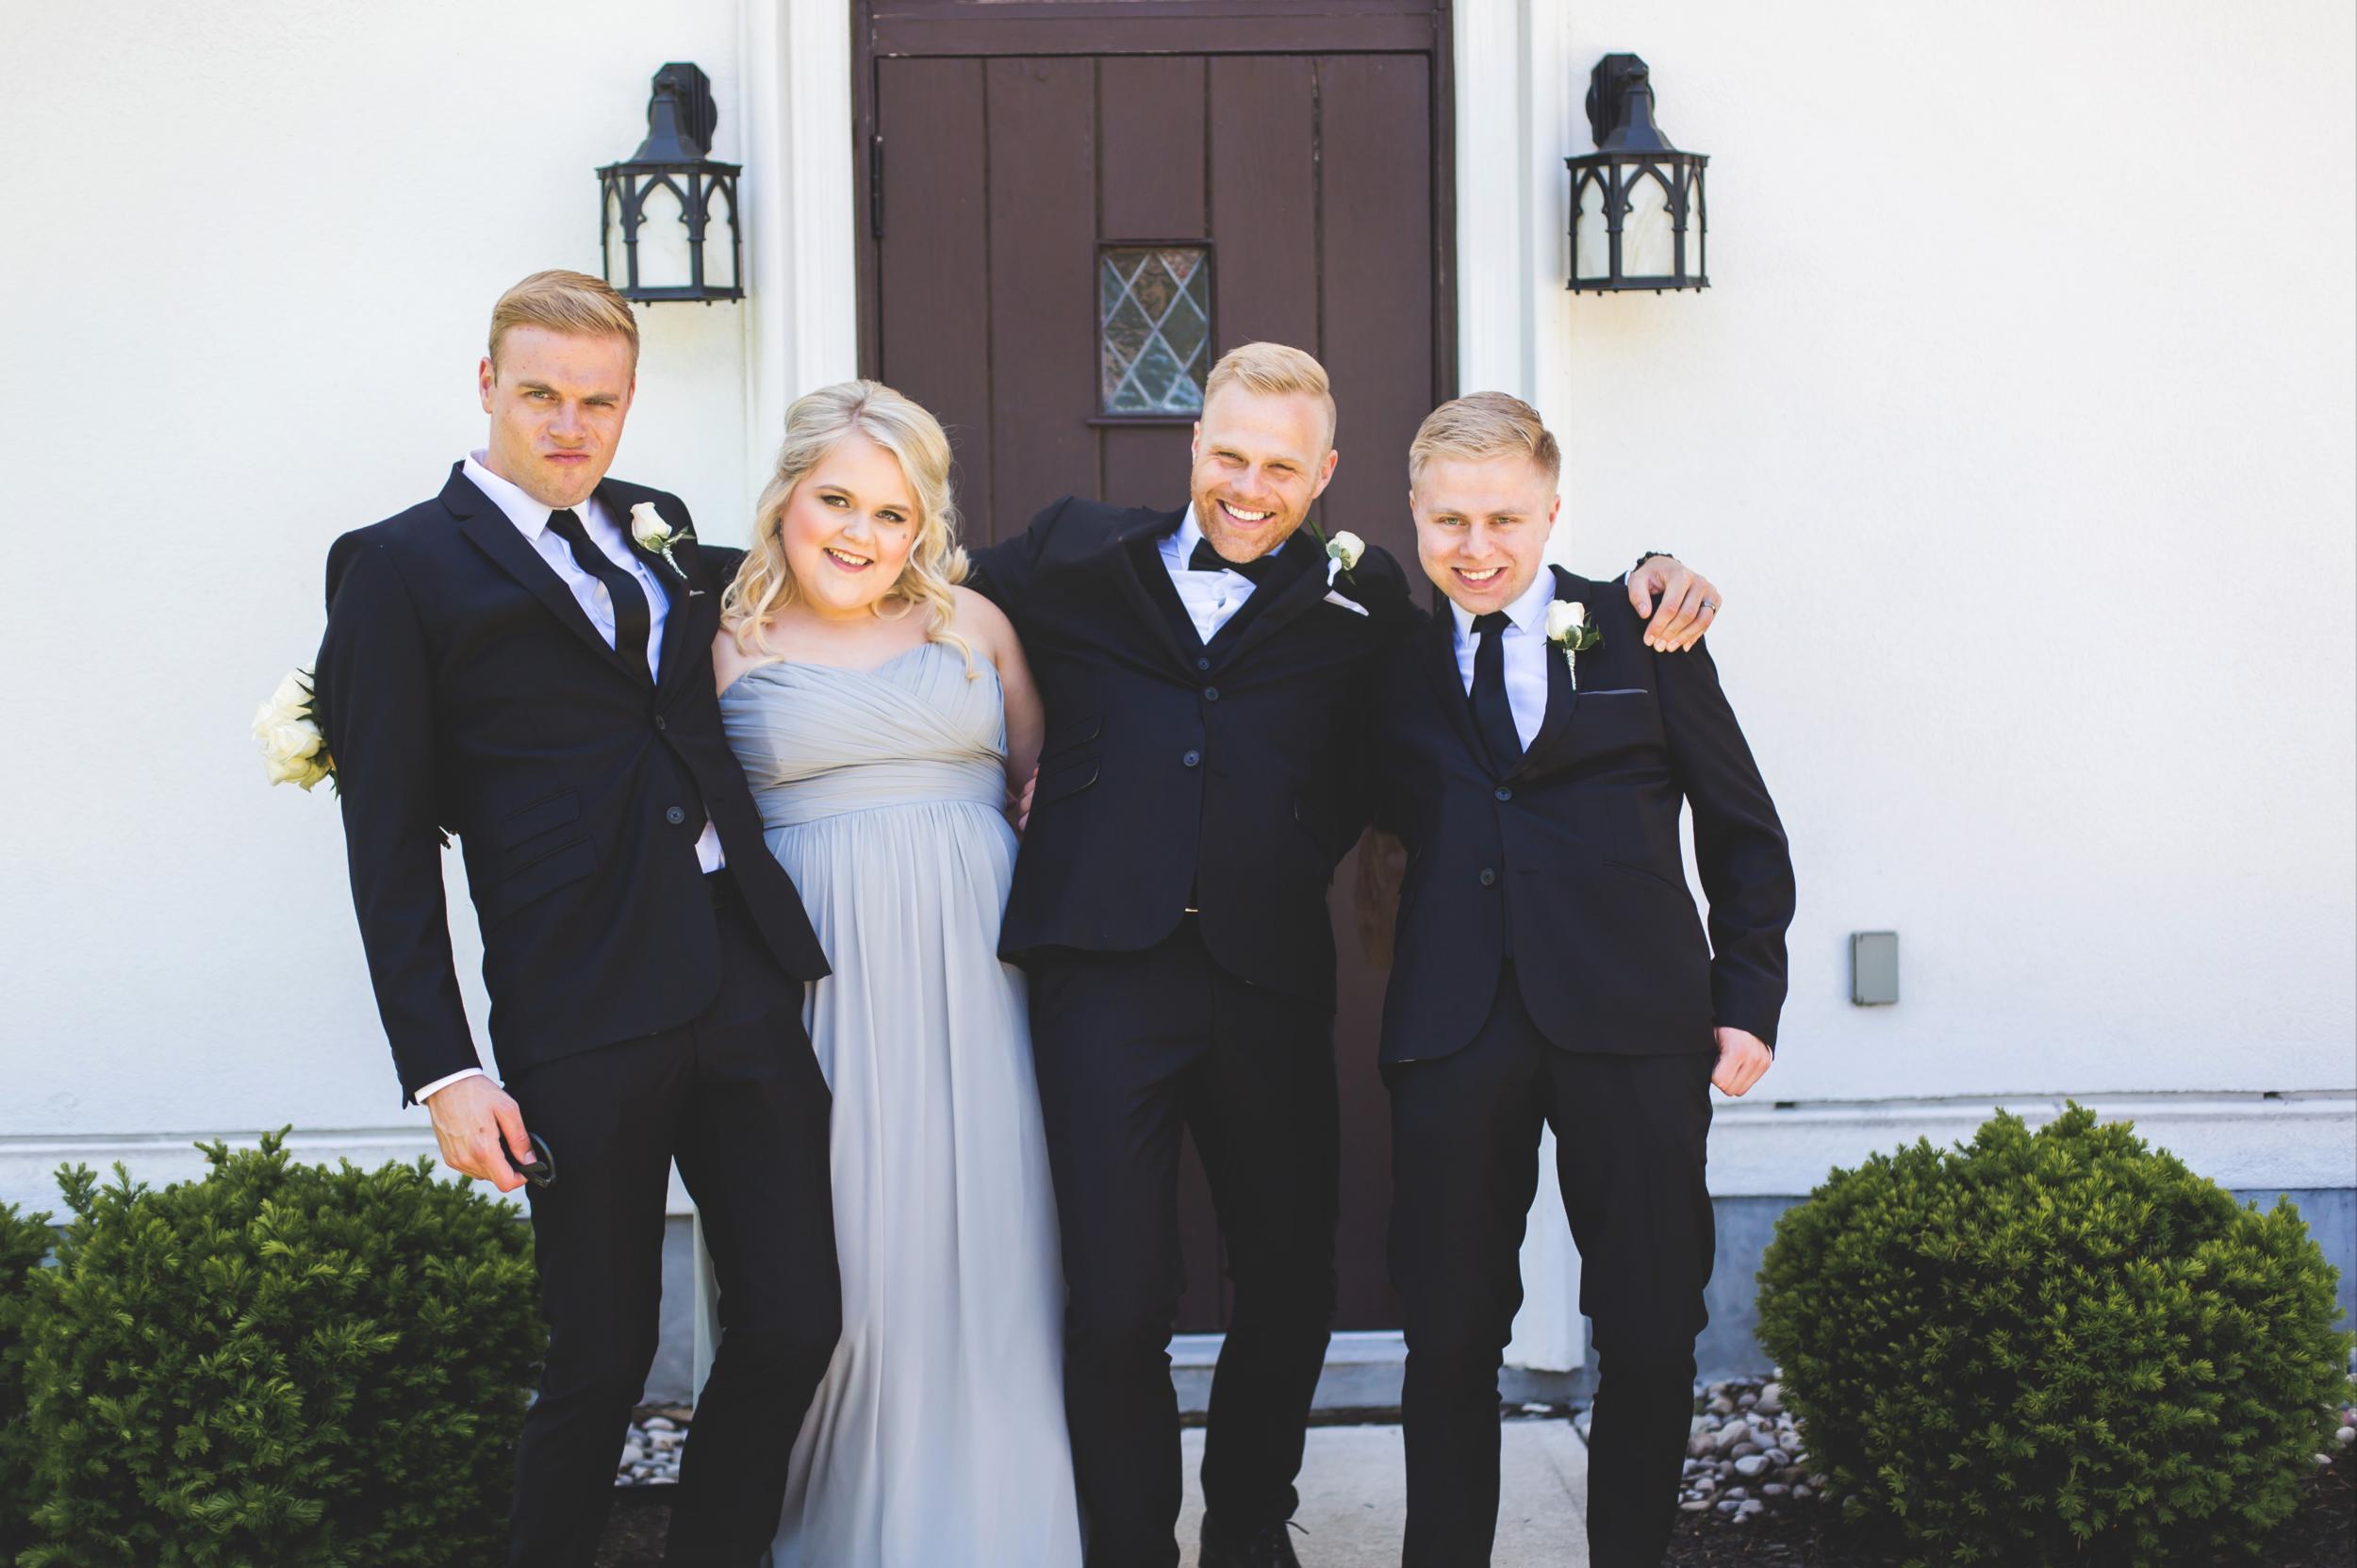 Wedding-Harbour-Banquet-Center-Oakville-Photographer-Wedding-Hamilton-Saint-James-Espresso-Downtown-HamOnt-GTA-Niagara-Toronto-Moments-by-Lauren-Photography-Photo-Image-22.png